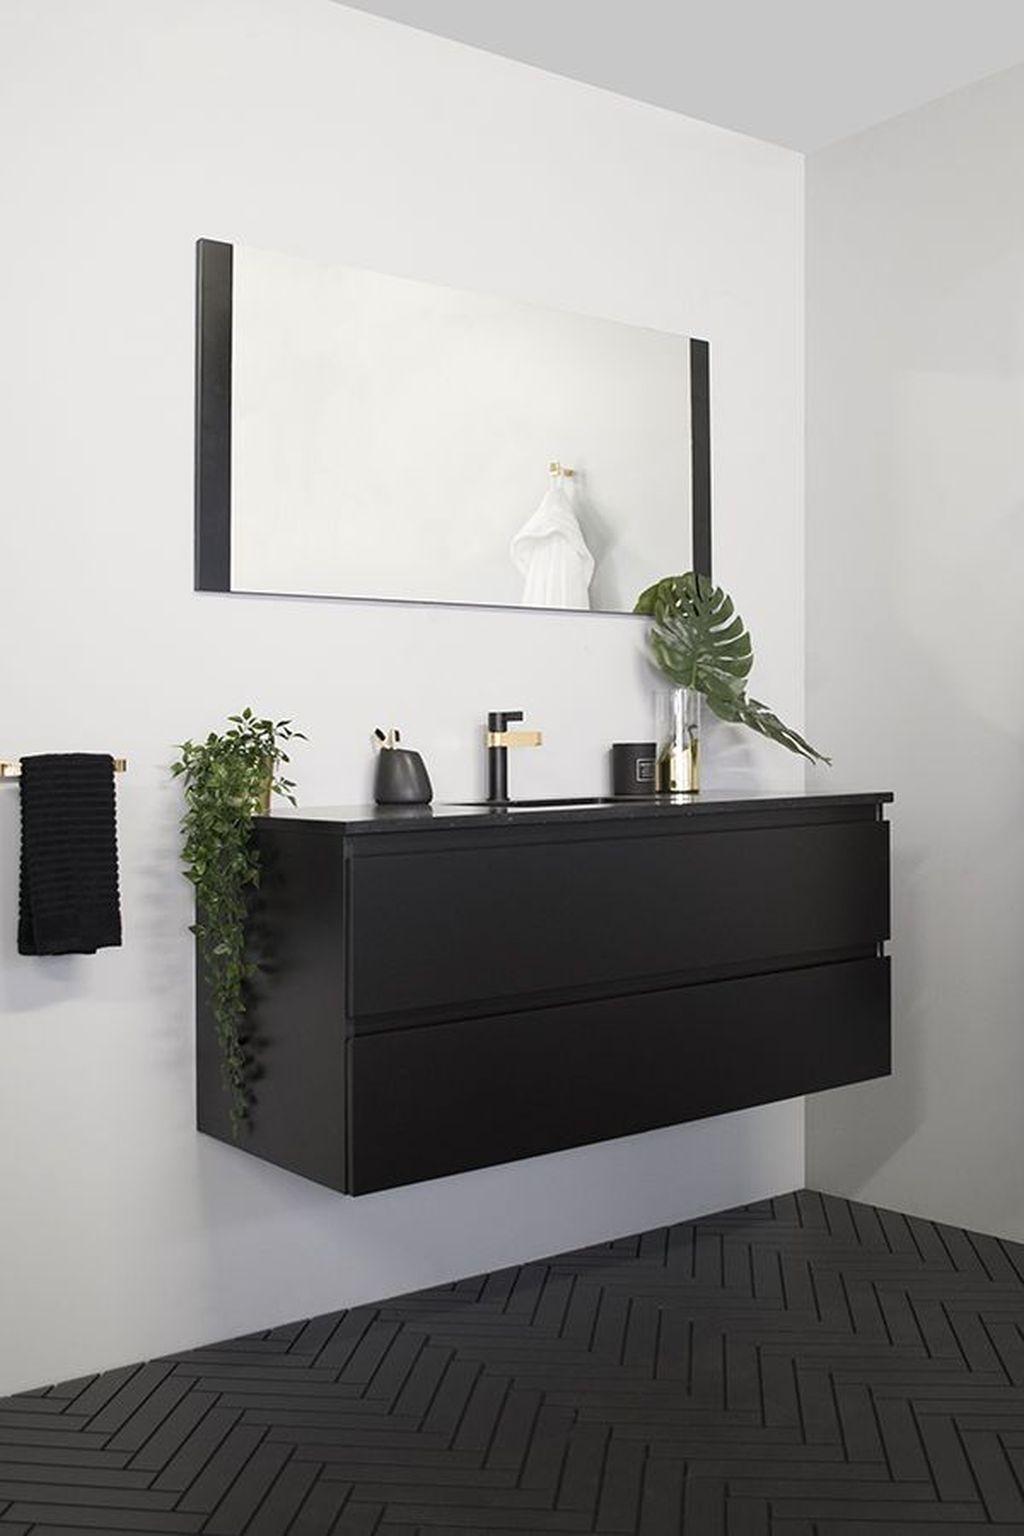 black floating cabinet, black patterned floor, white wall, black framed mirror